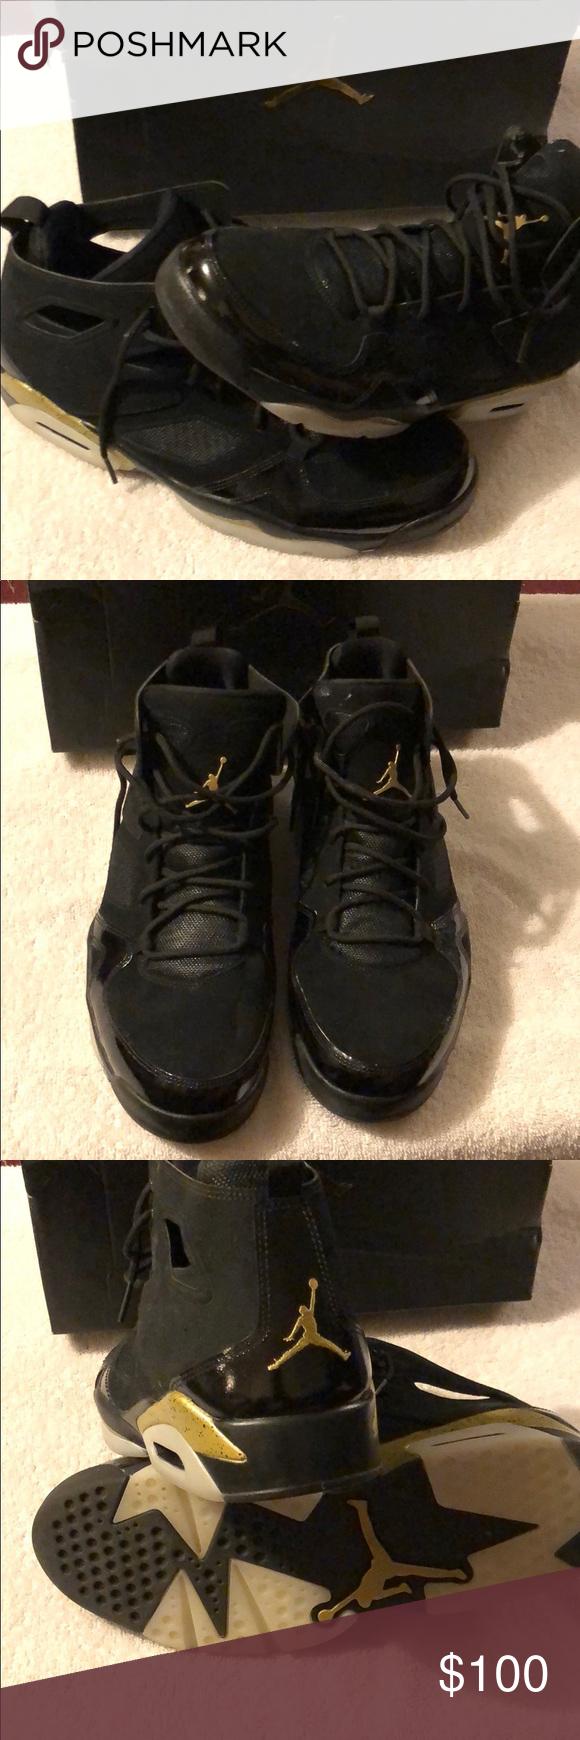 5f429b8c354a35 Authentic Jordan CP3.X AE Authentic Jordan CP3.X AE Black   Sail   Dark  Grey Worn Once Jordan Shoes Sneakers